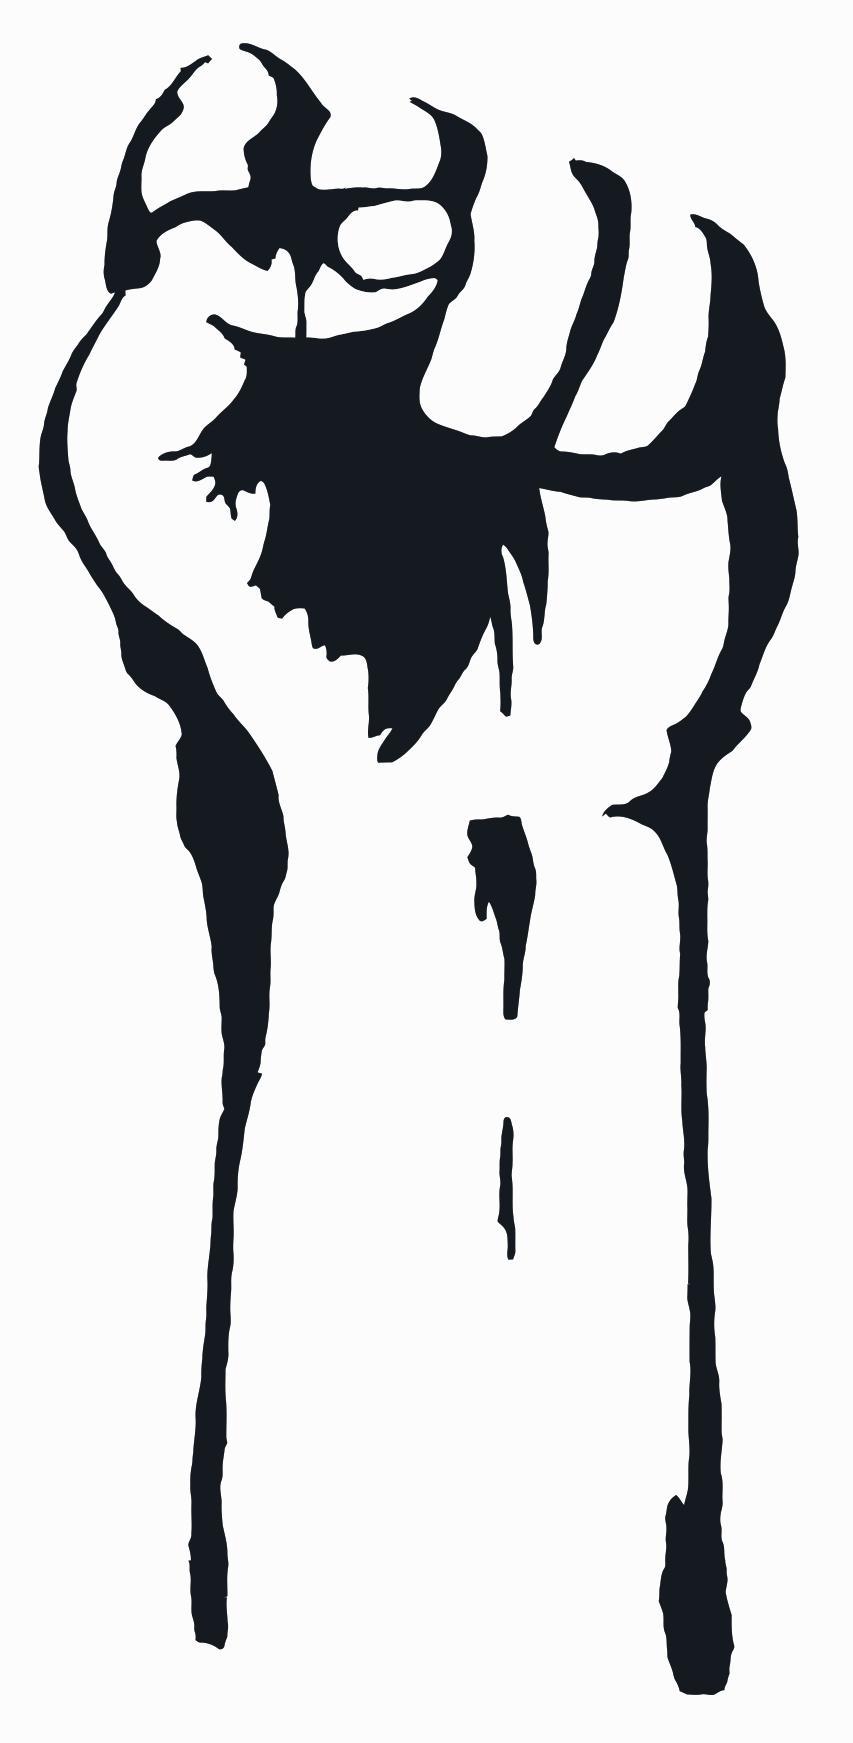 853x1743 Clip Art Woman Fist Pump Clipart